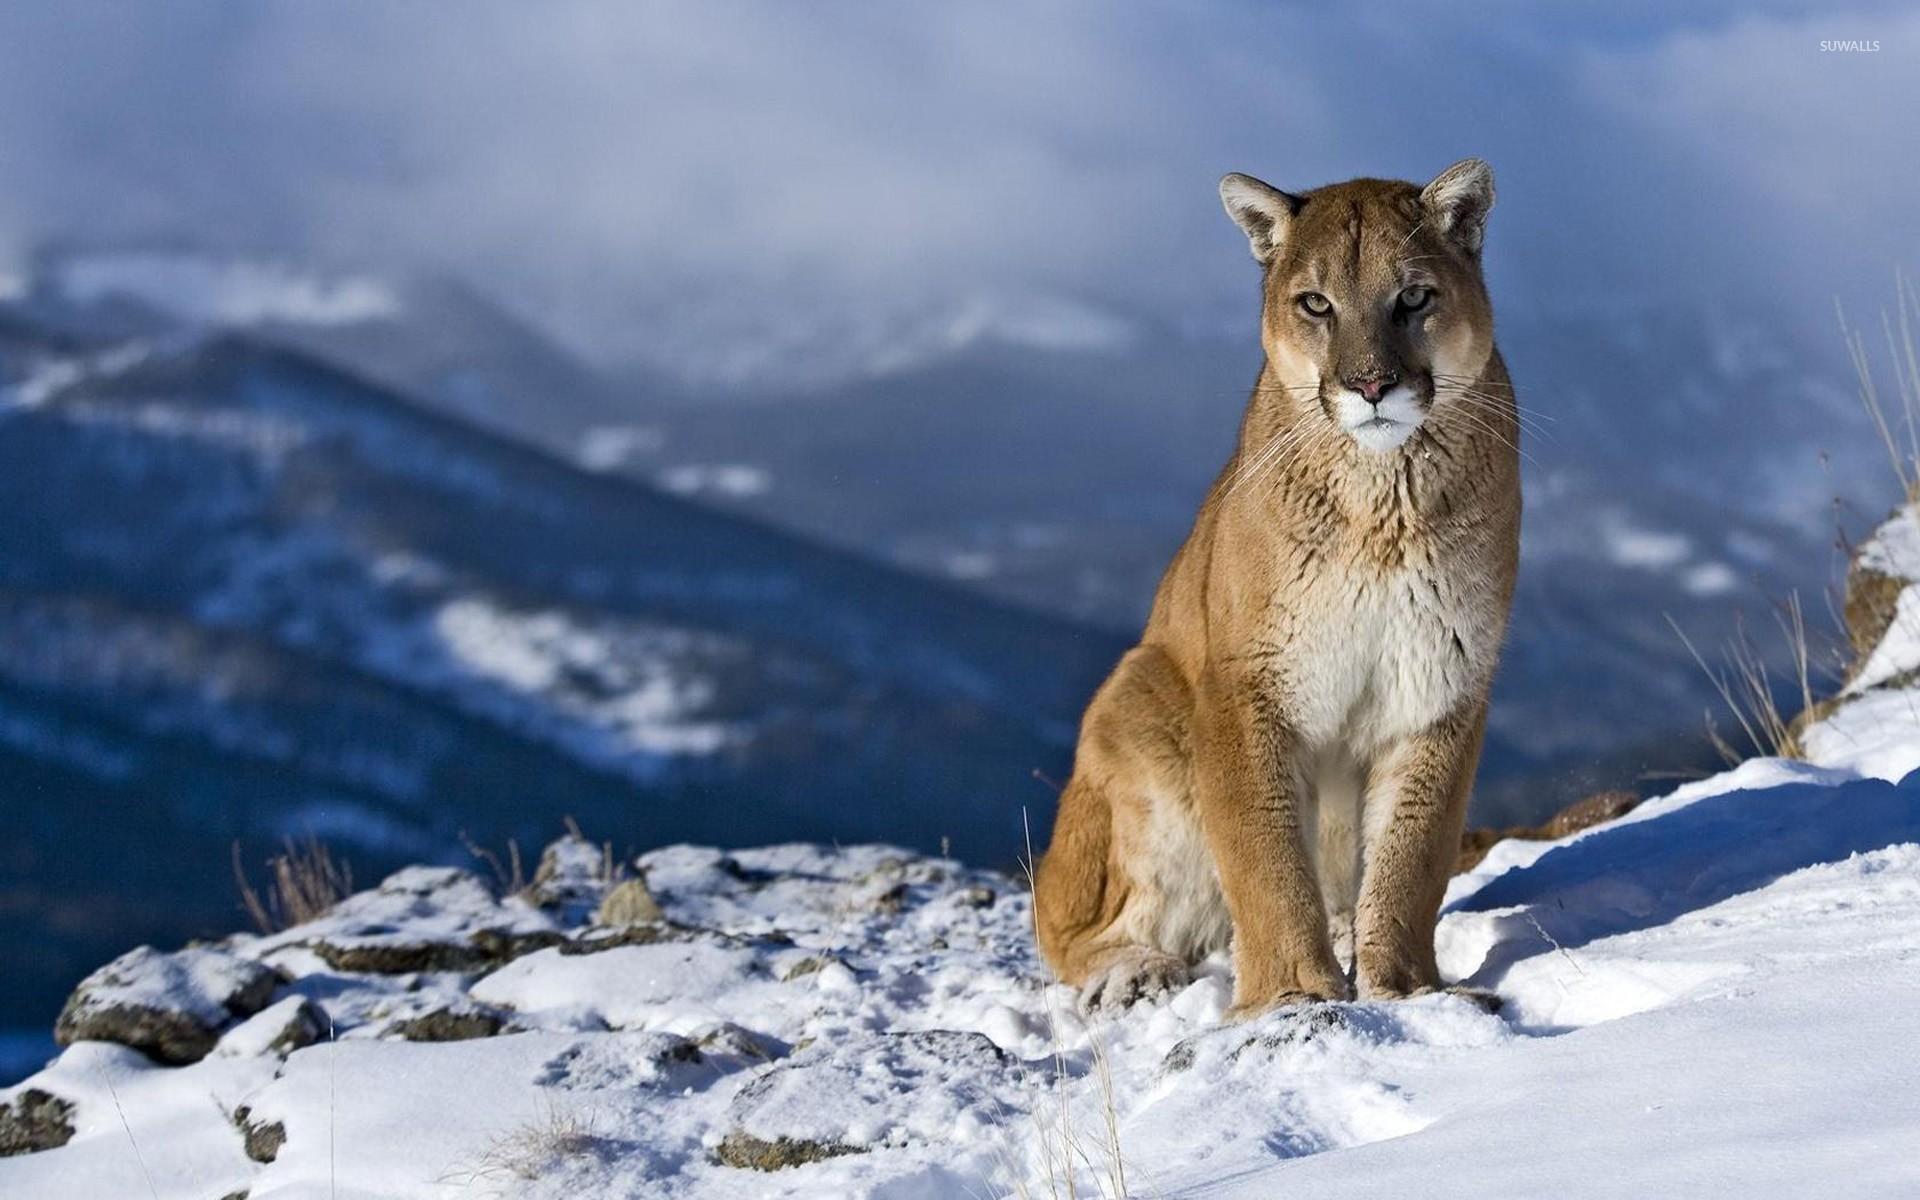 cougar wallpaper - animal wallpapers - #8710